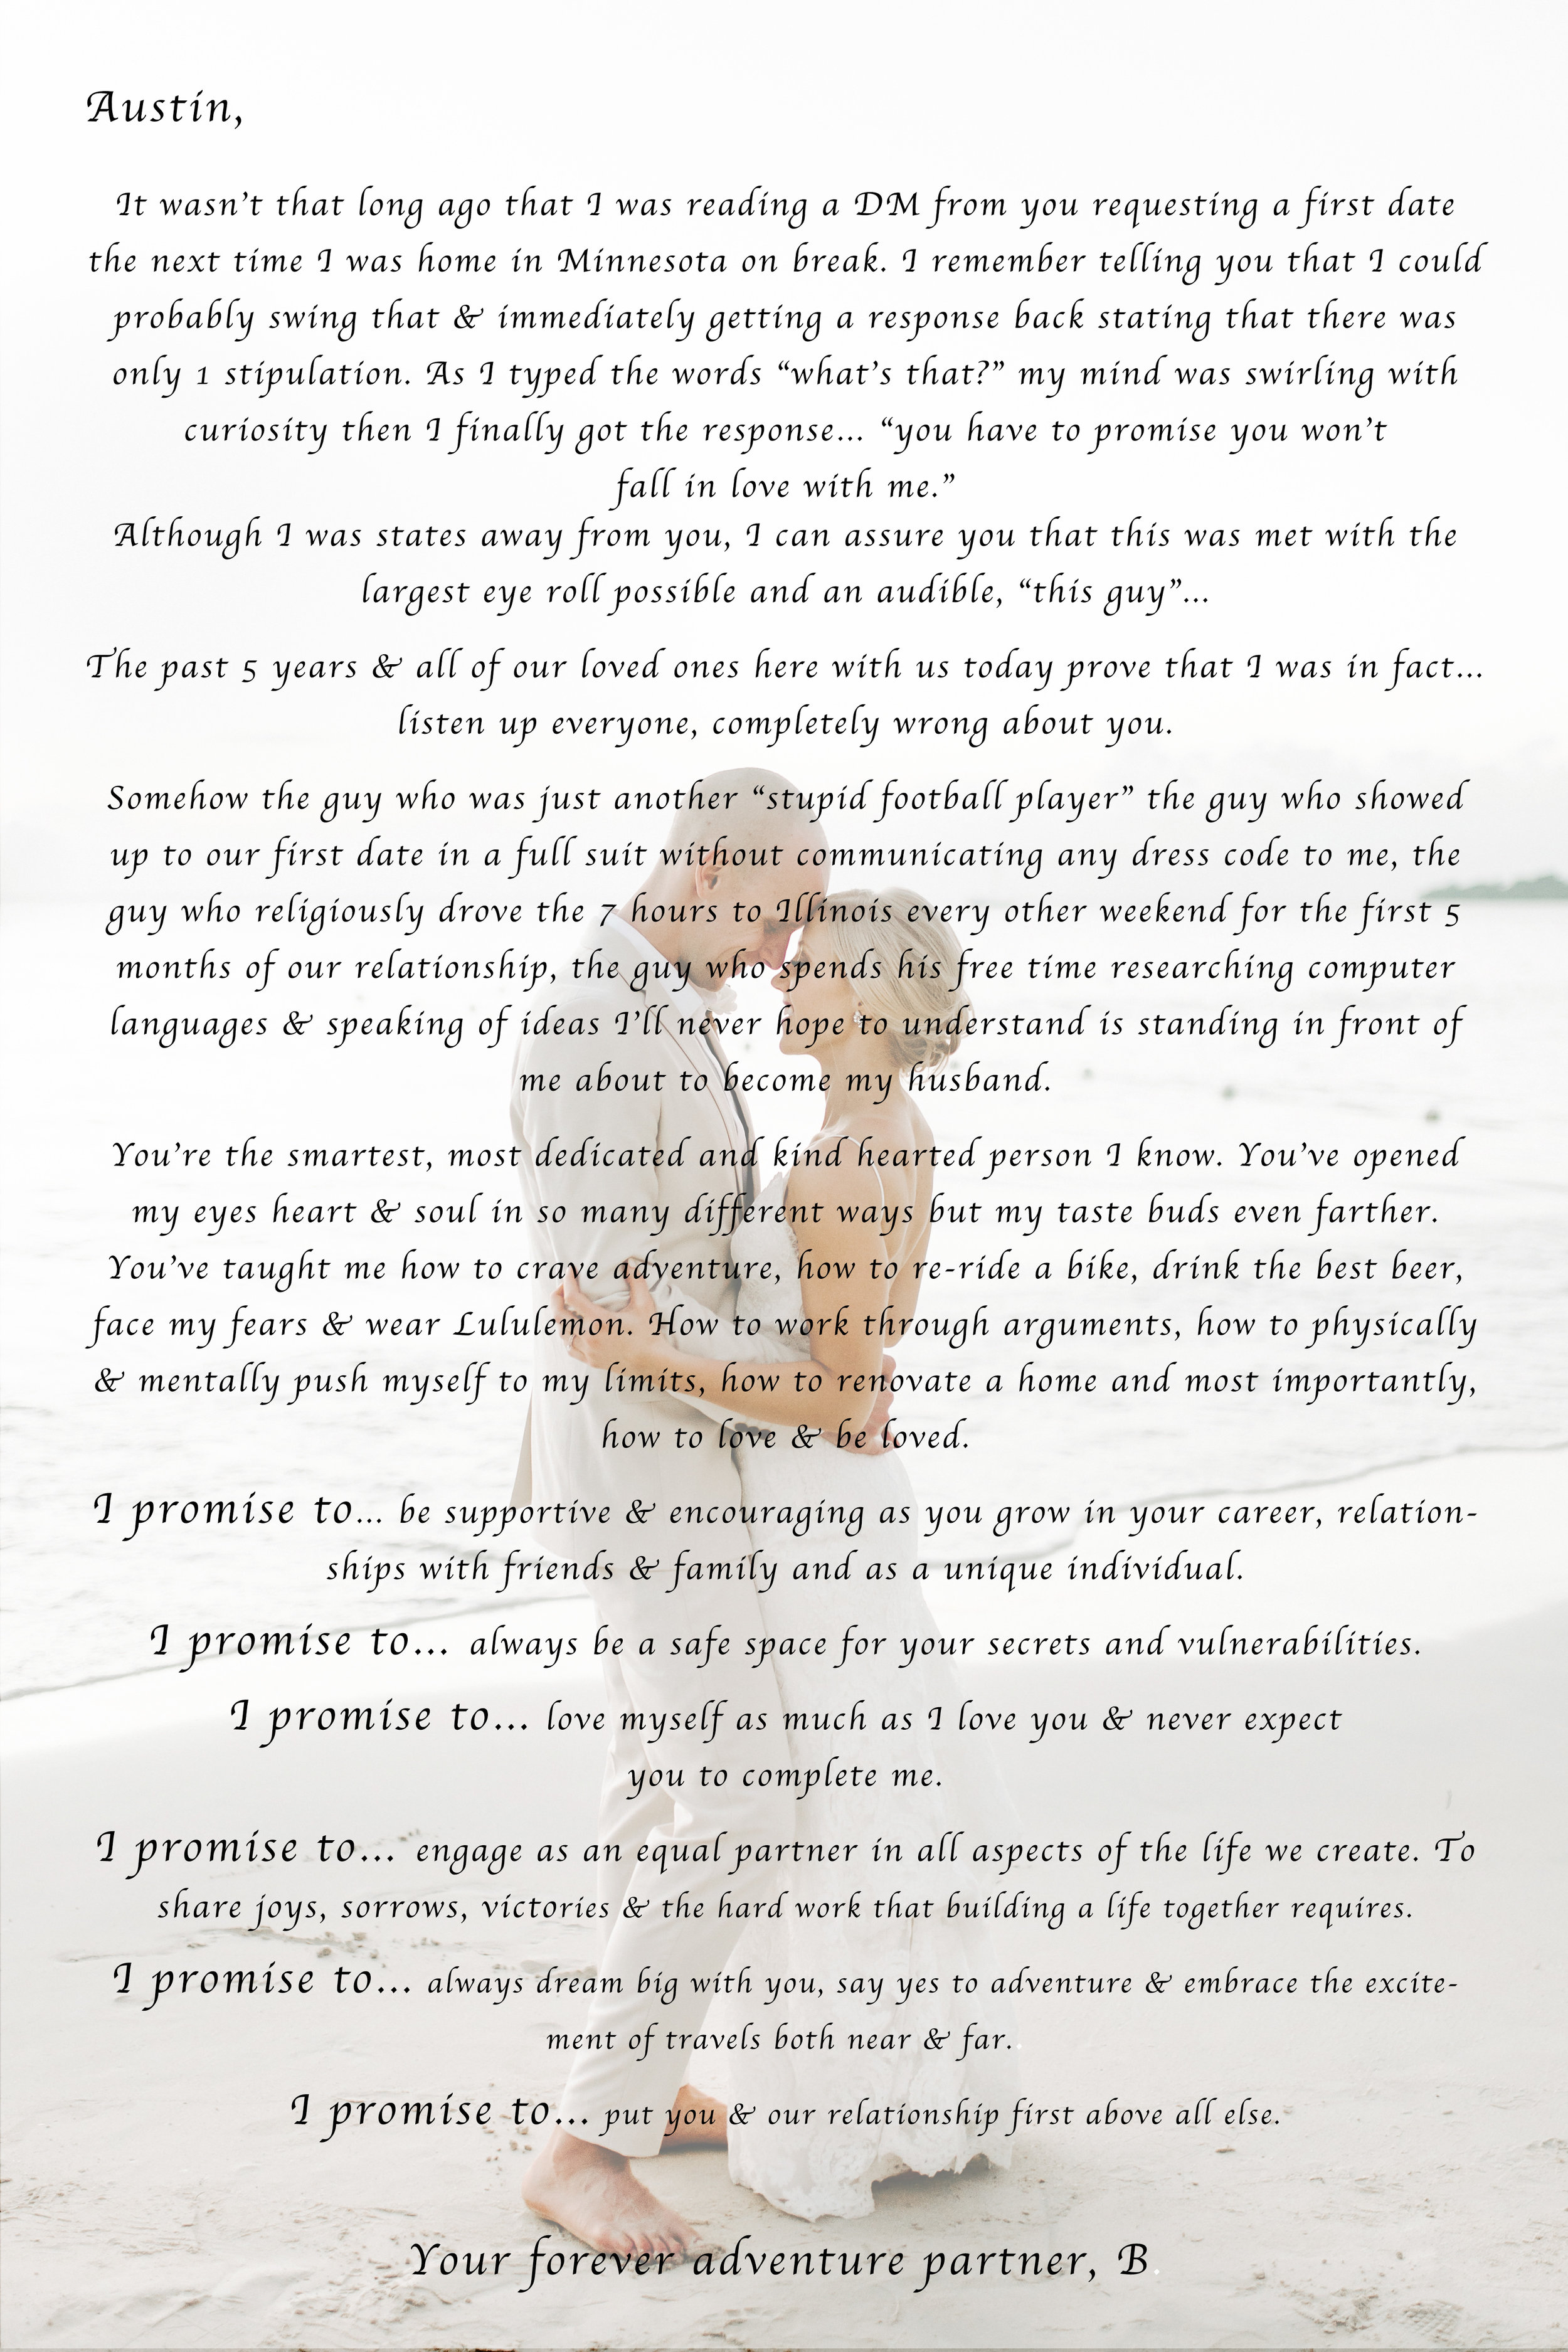 Wedding Vows, Modern Wedding Vows, Beach Wedding Vows, Personal Wedding Vows, Vows, Non Traditional Wedding Vows, Beach Wedding Destination Wedding, Define Fettle